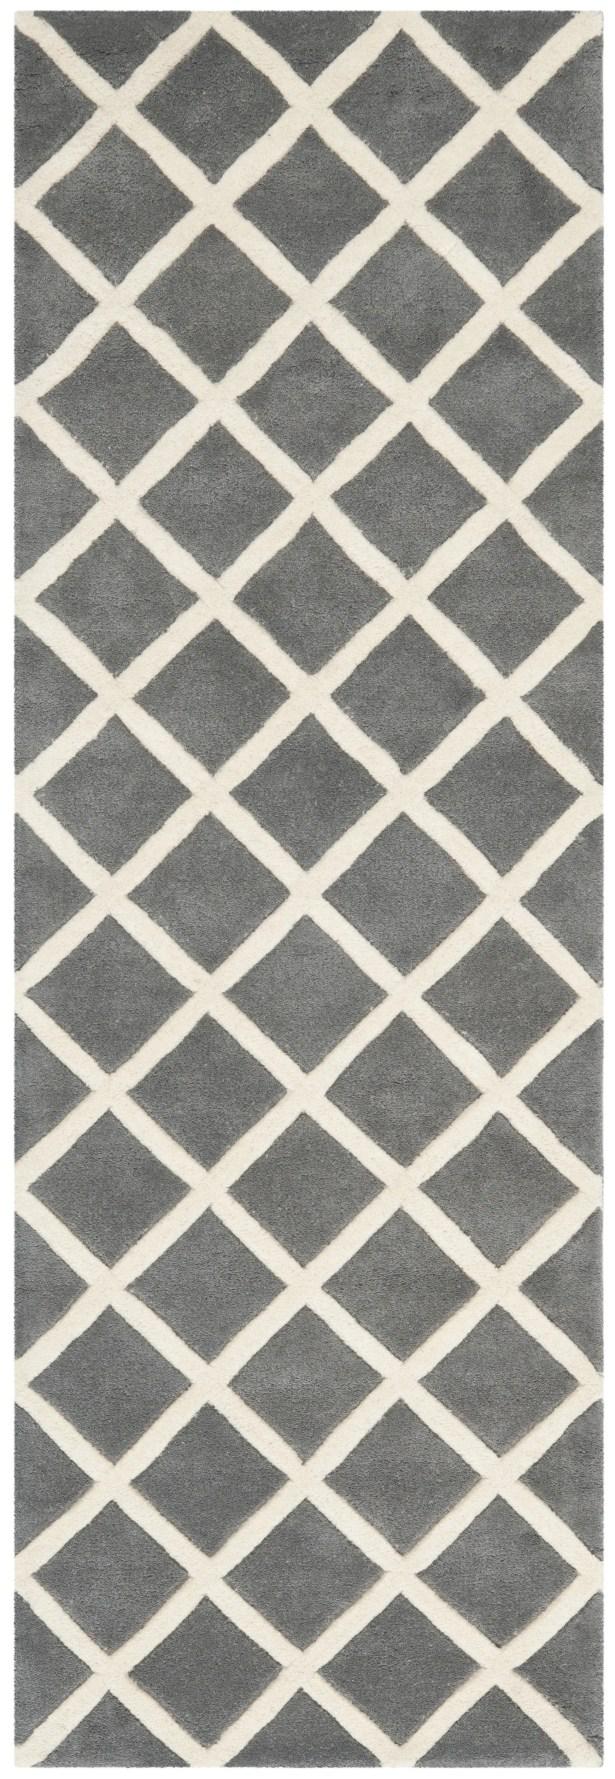 Wilkin Hand-Tufted Dark Gray/Ivory Area Rug Rug Size: Runner 2'3